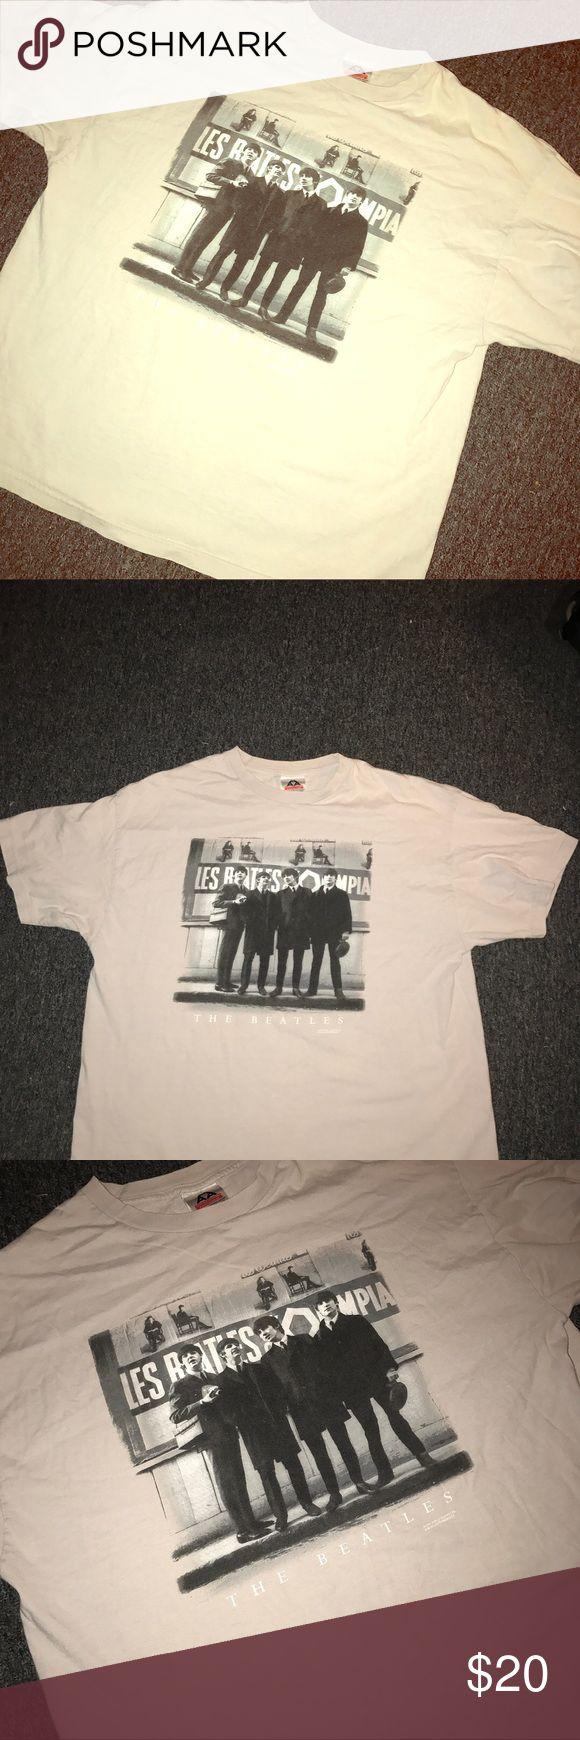 Vintage Beatles T shirt Clean rare over seas Vintage Beatle t shirt Shirts Tees - Short Sleeve